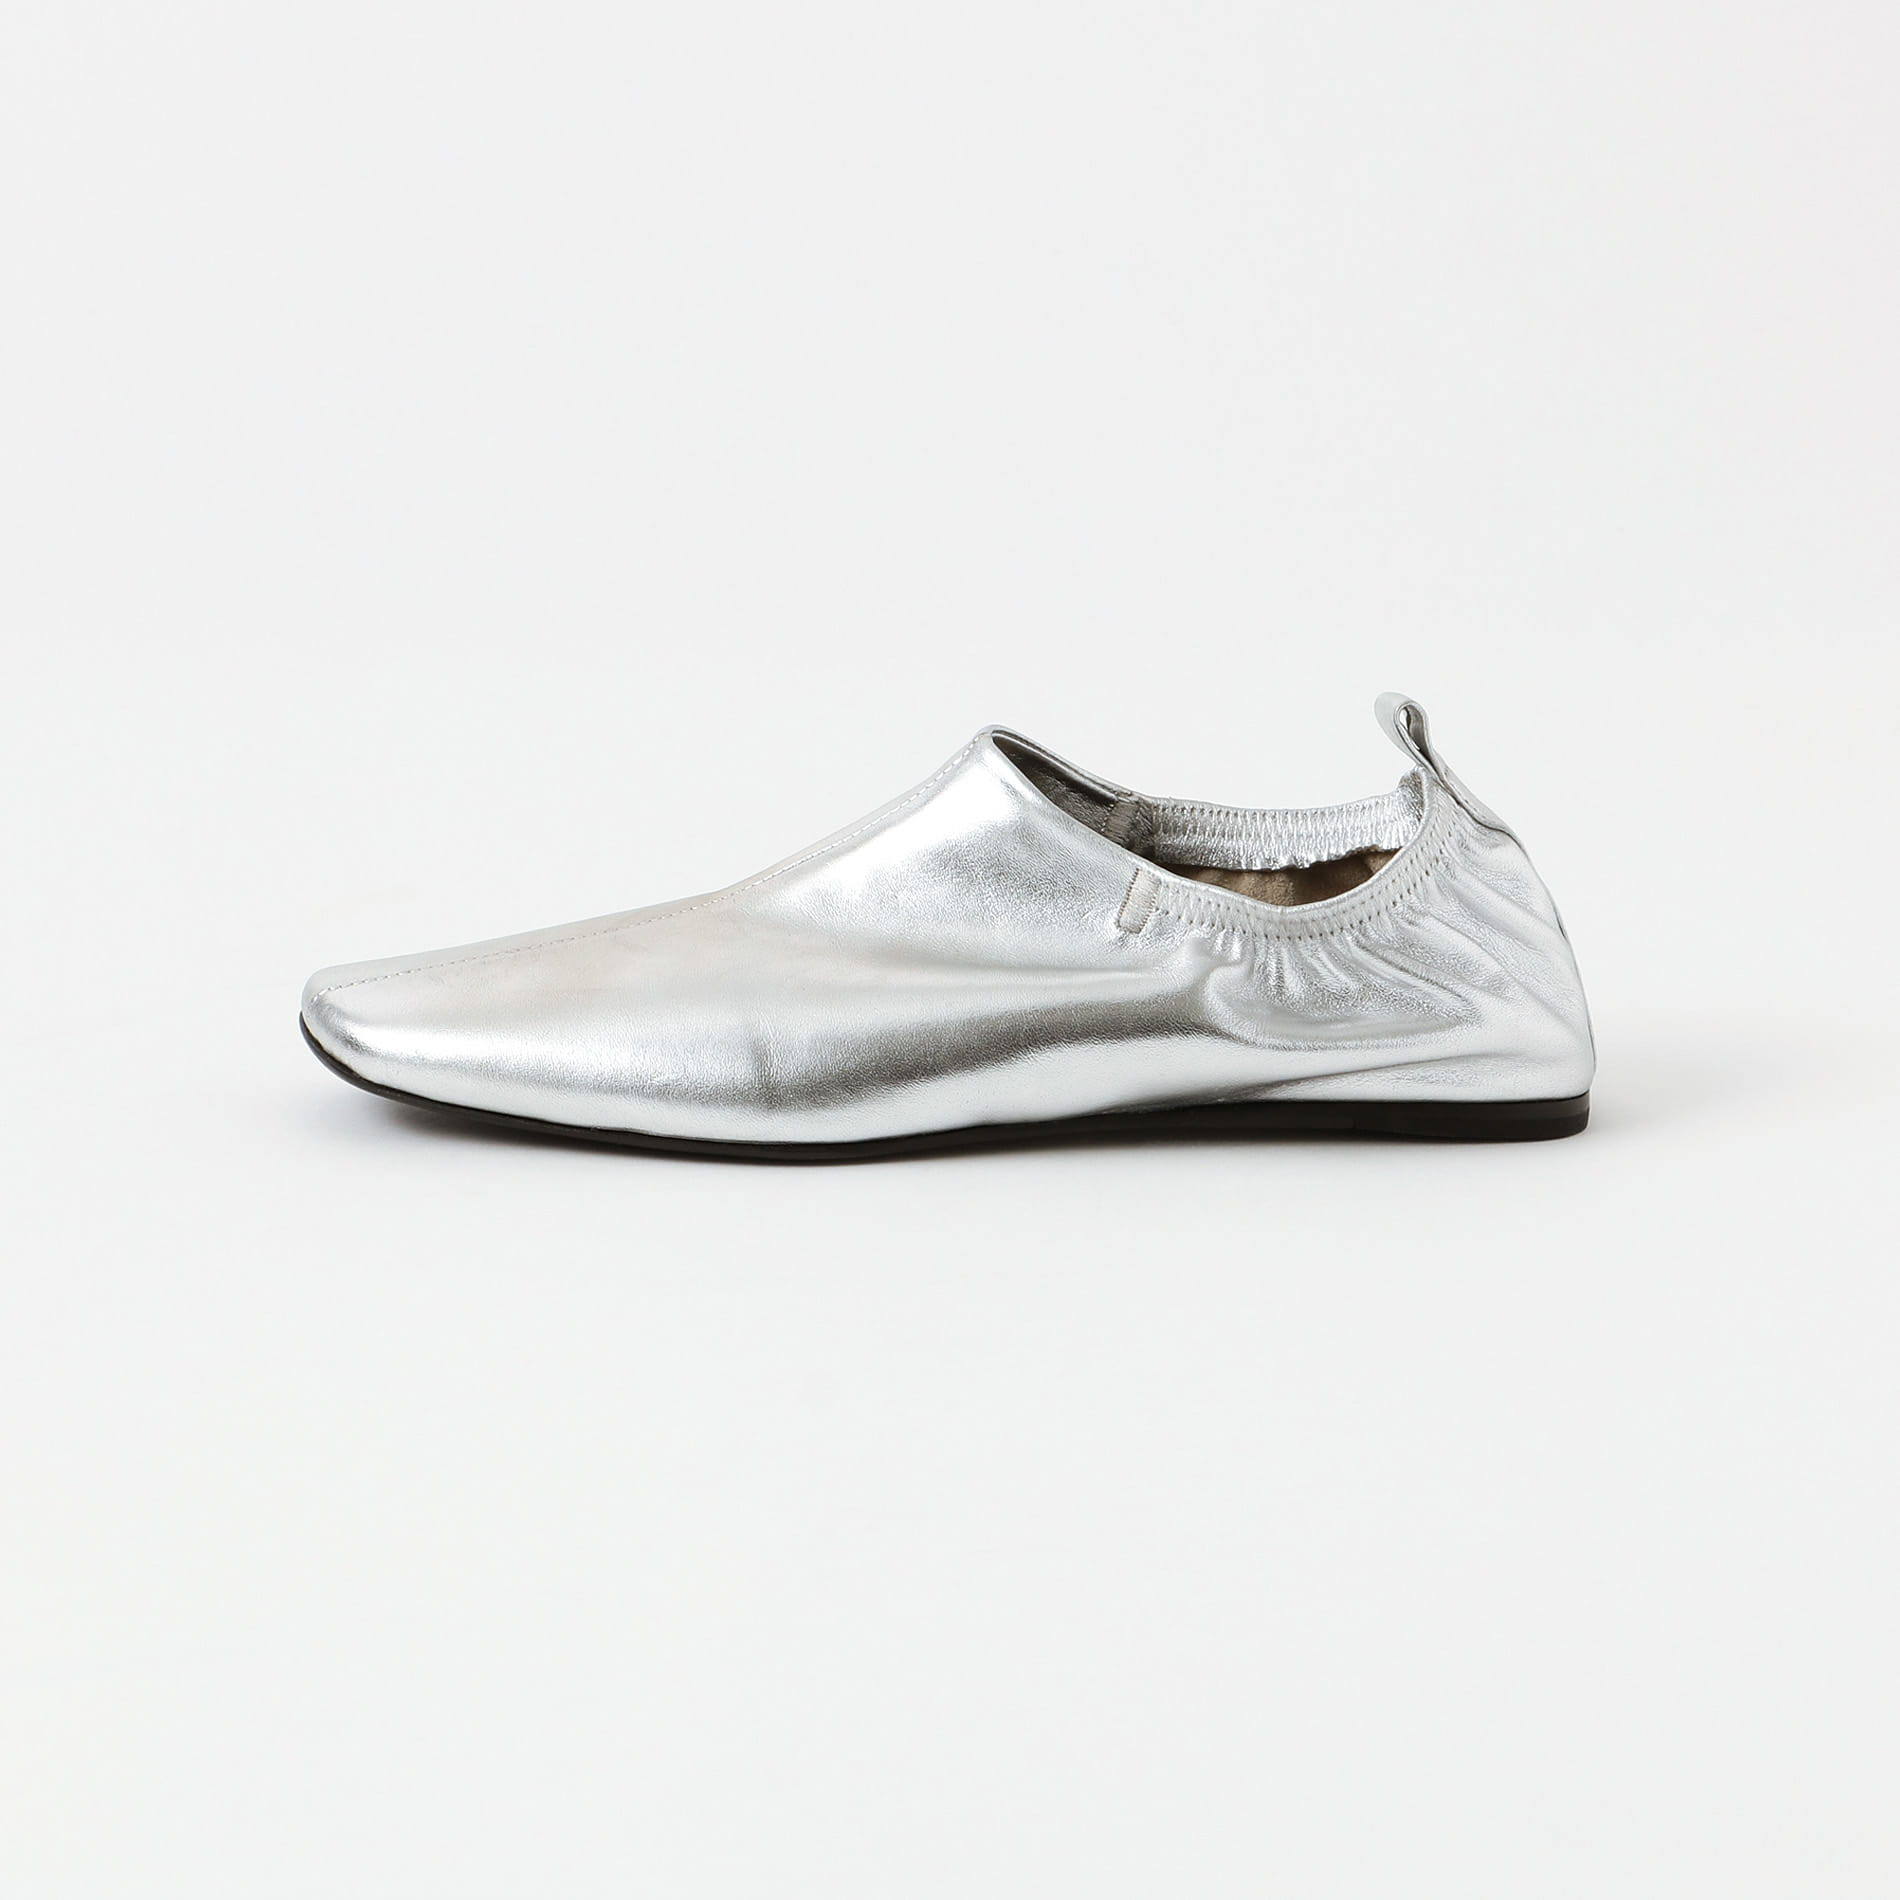 【DUBIE】WOMEN シューズ Soft napa leather 18AW2013 Tecno Flat